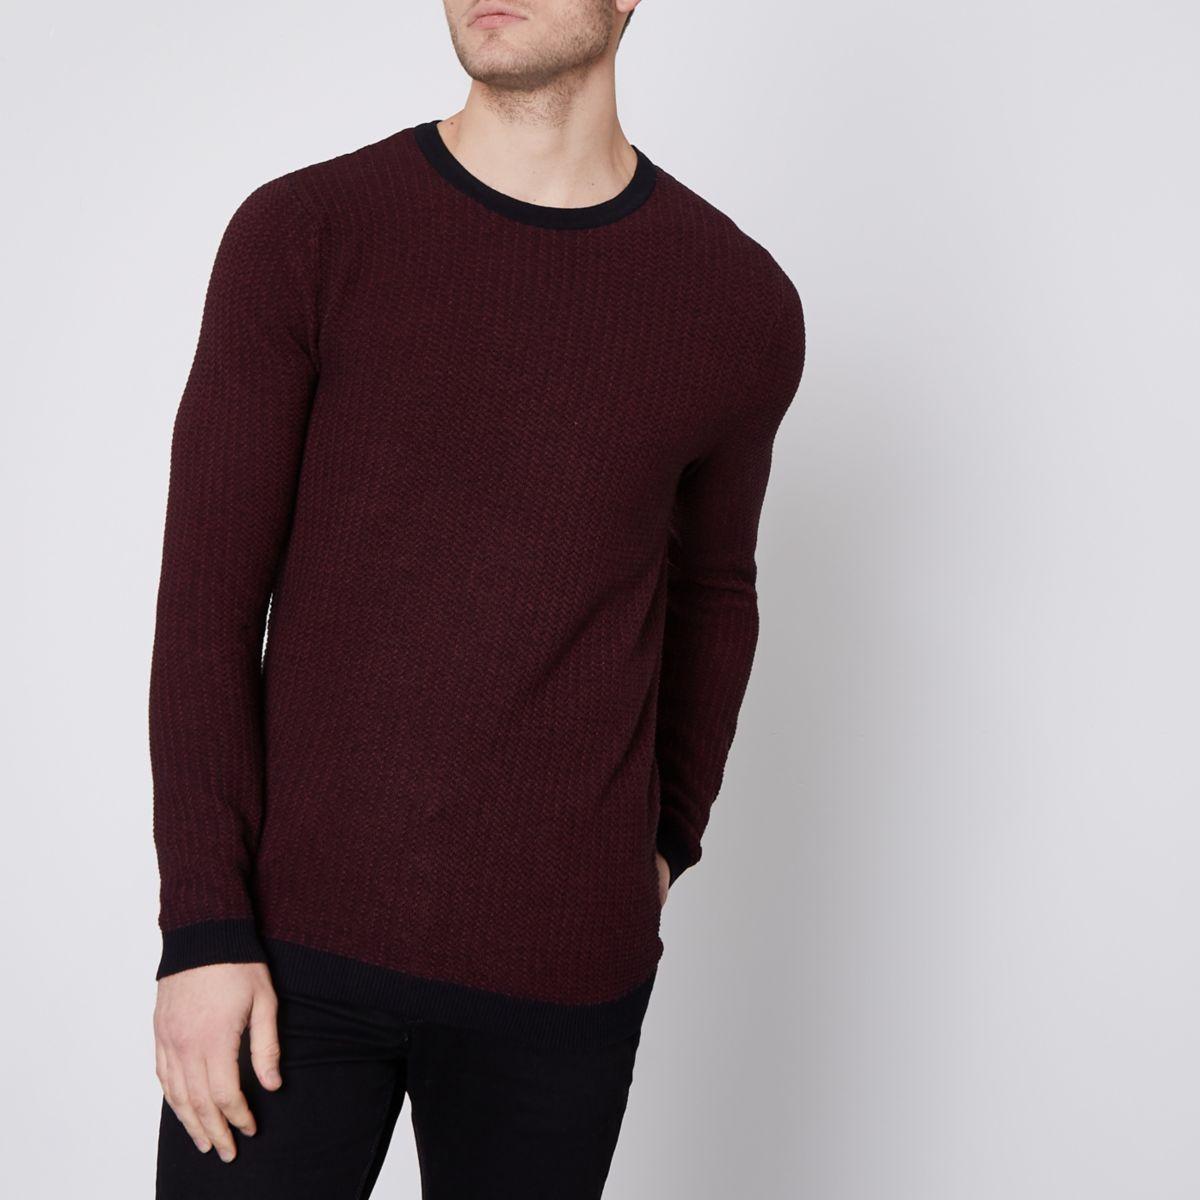 Burgundy Jack & Jones Premium knit sweater